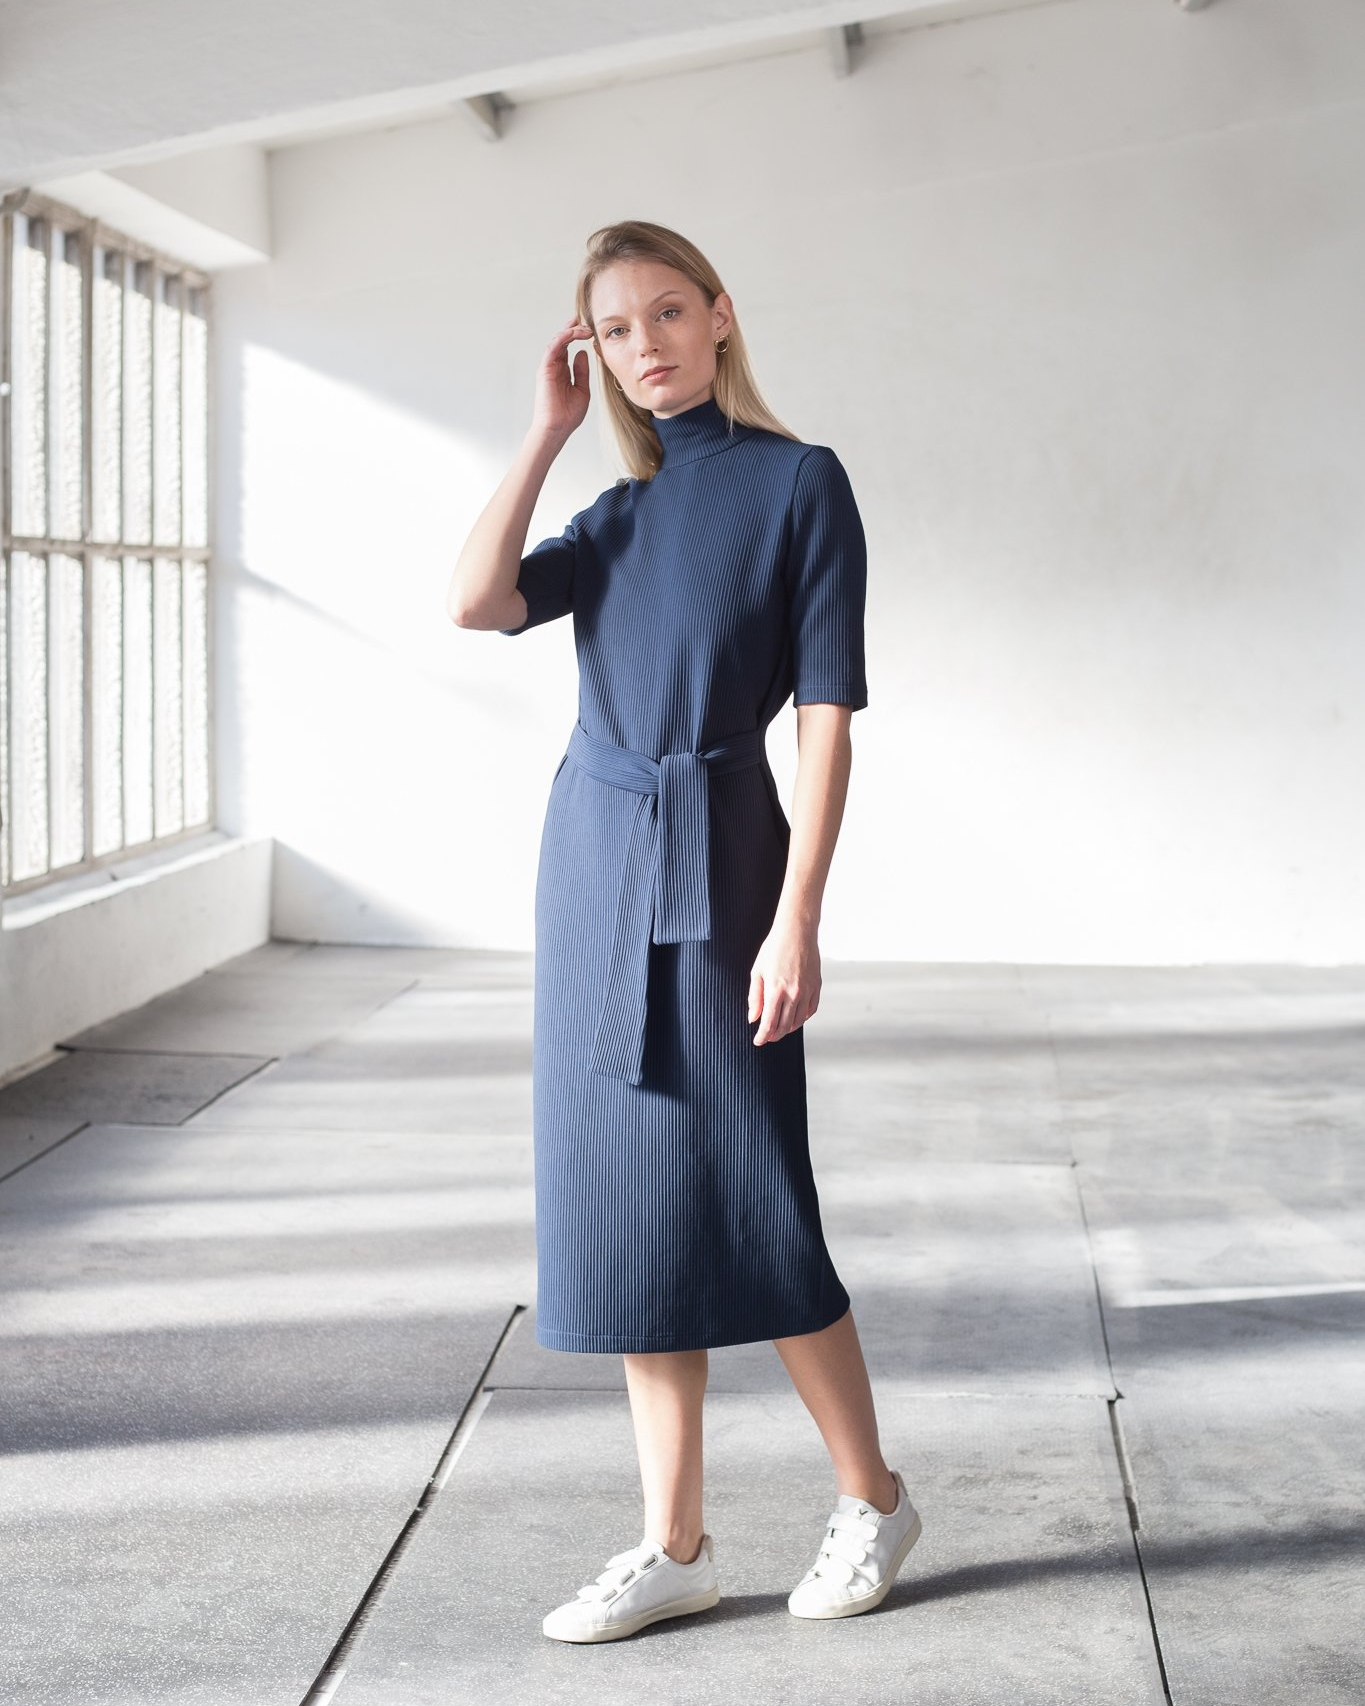 High-neck rib cotton dress in navy blue (€137)